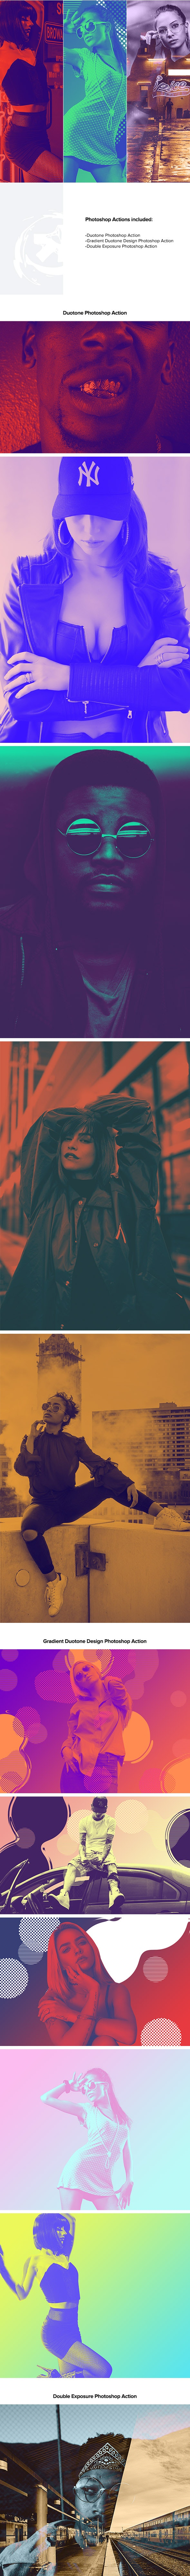 Duotone Photoshop Actions Bundle - Photo Effects Actions